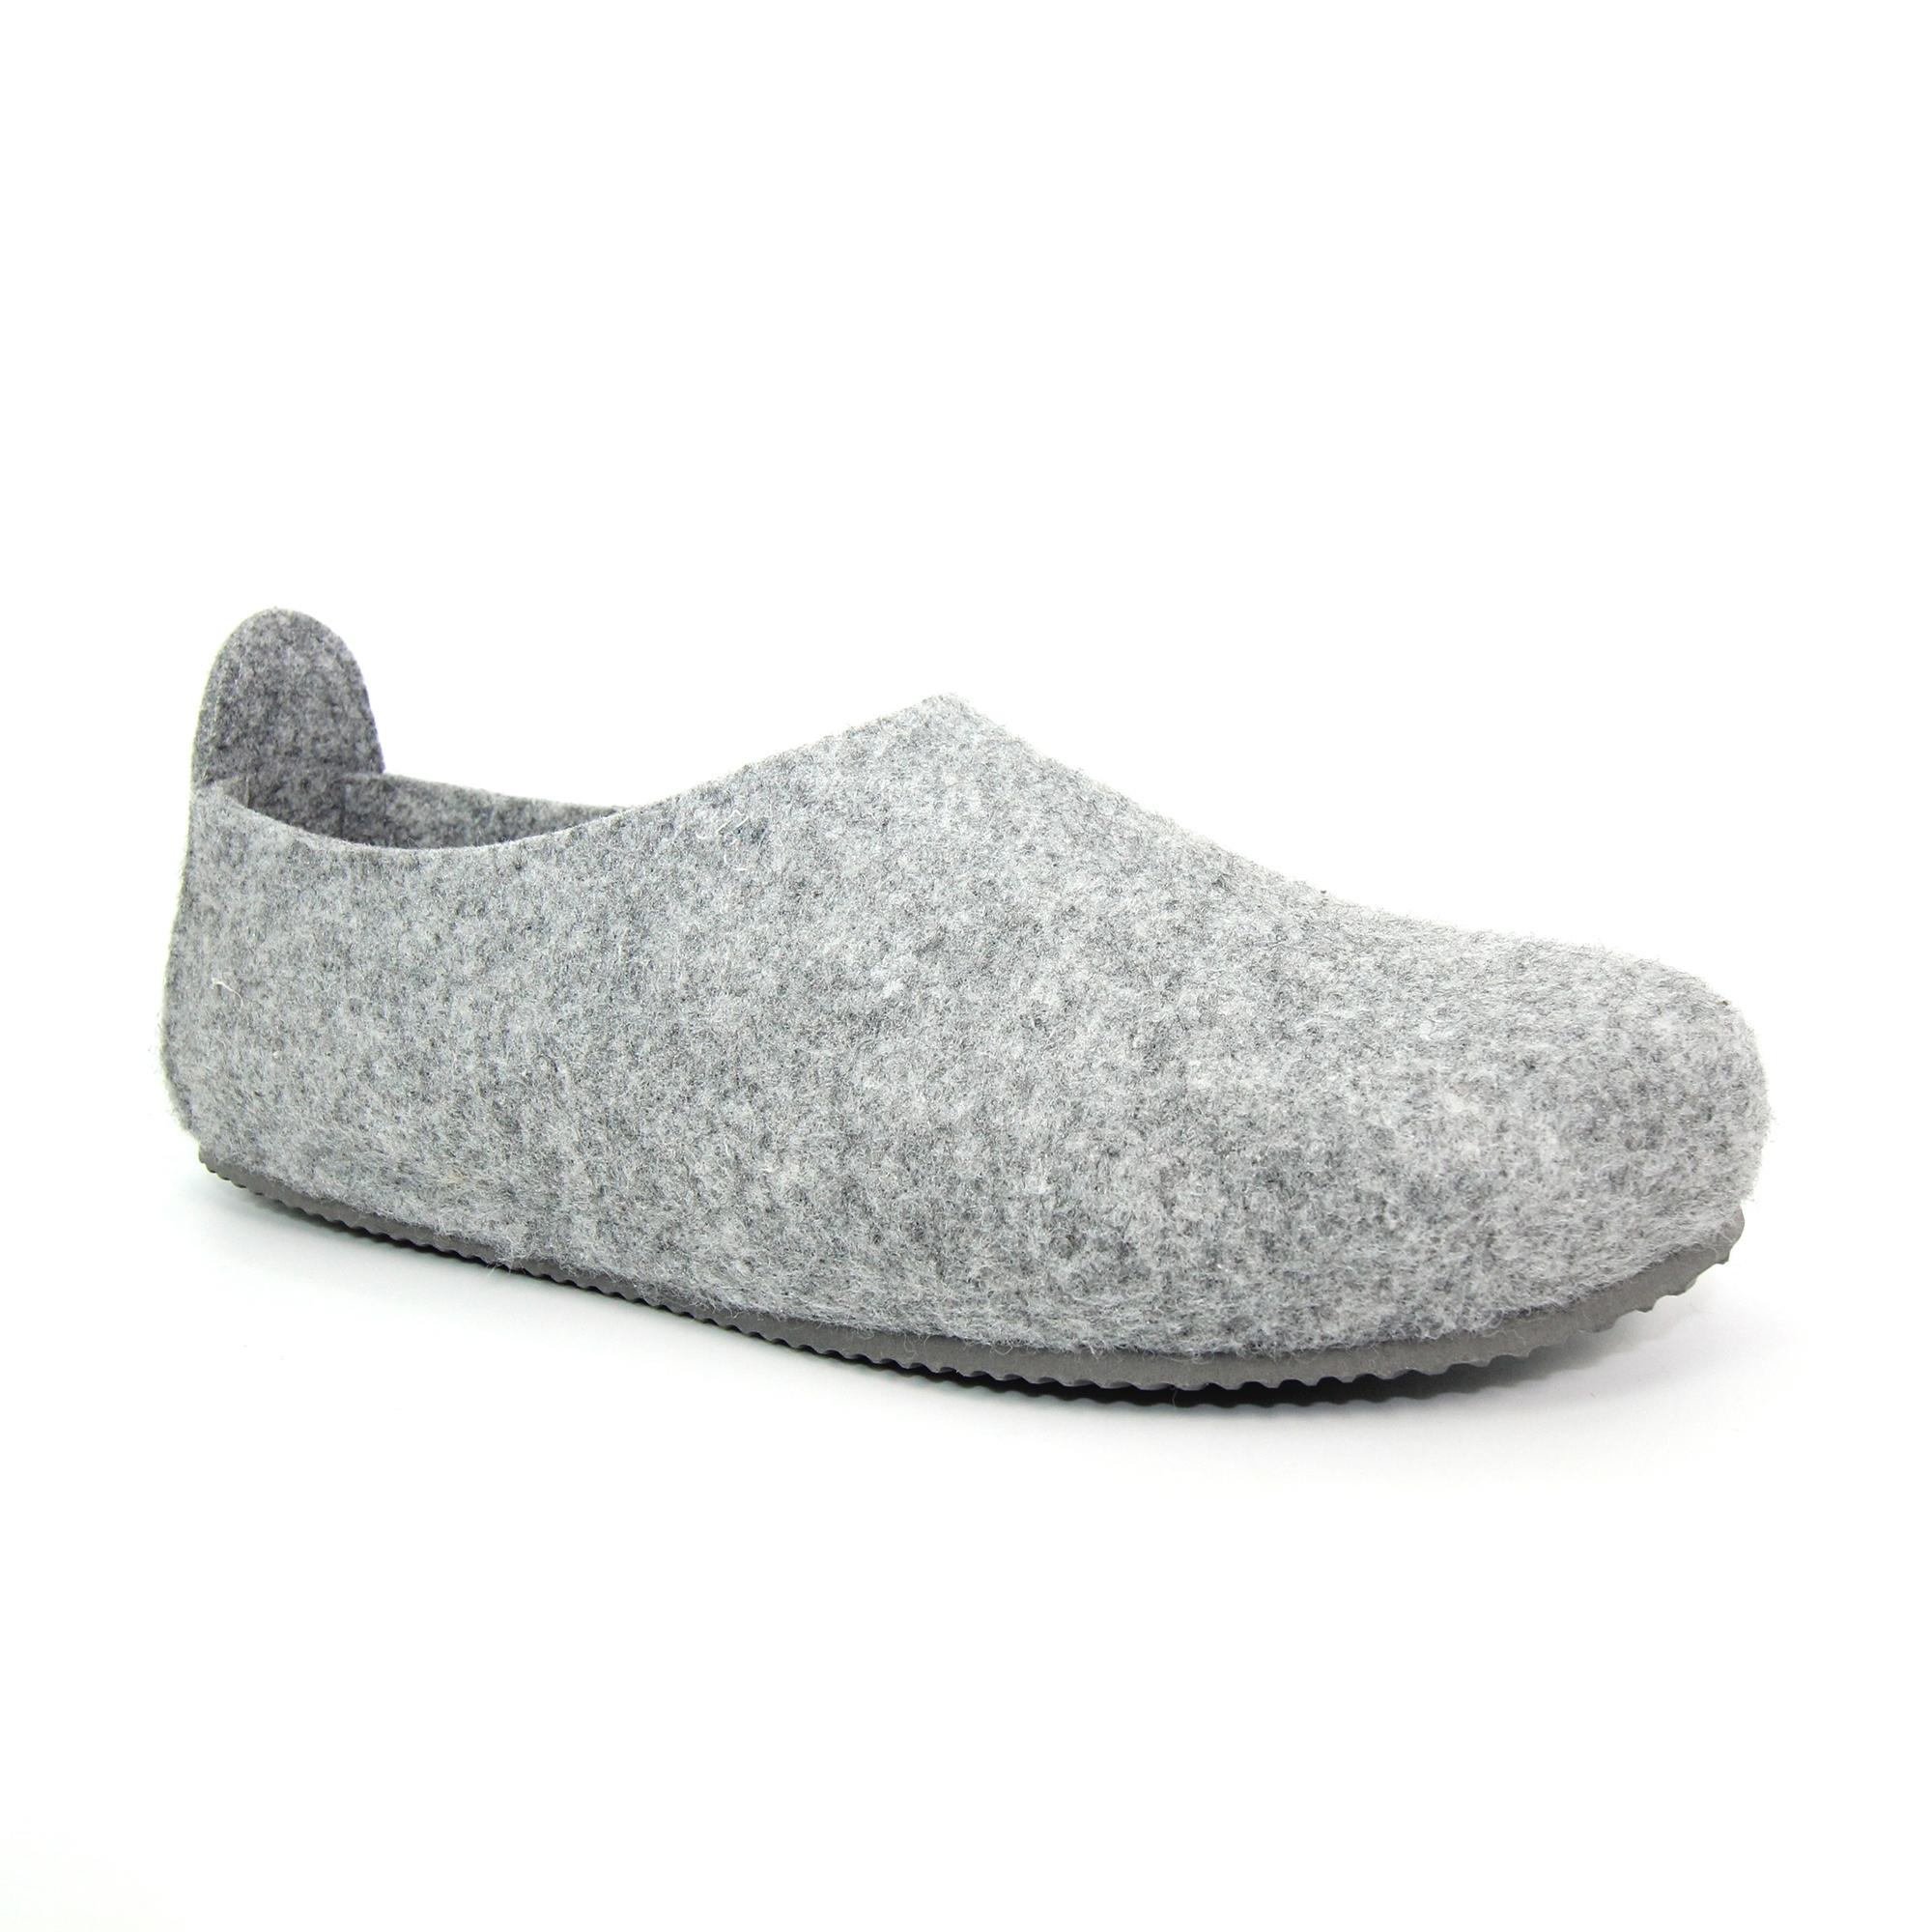 Slipper Republic Equinox Grey Comfort Slipper